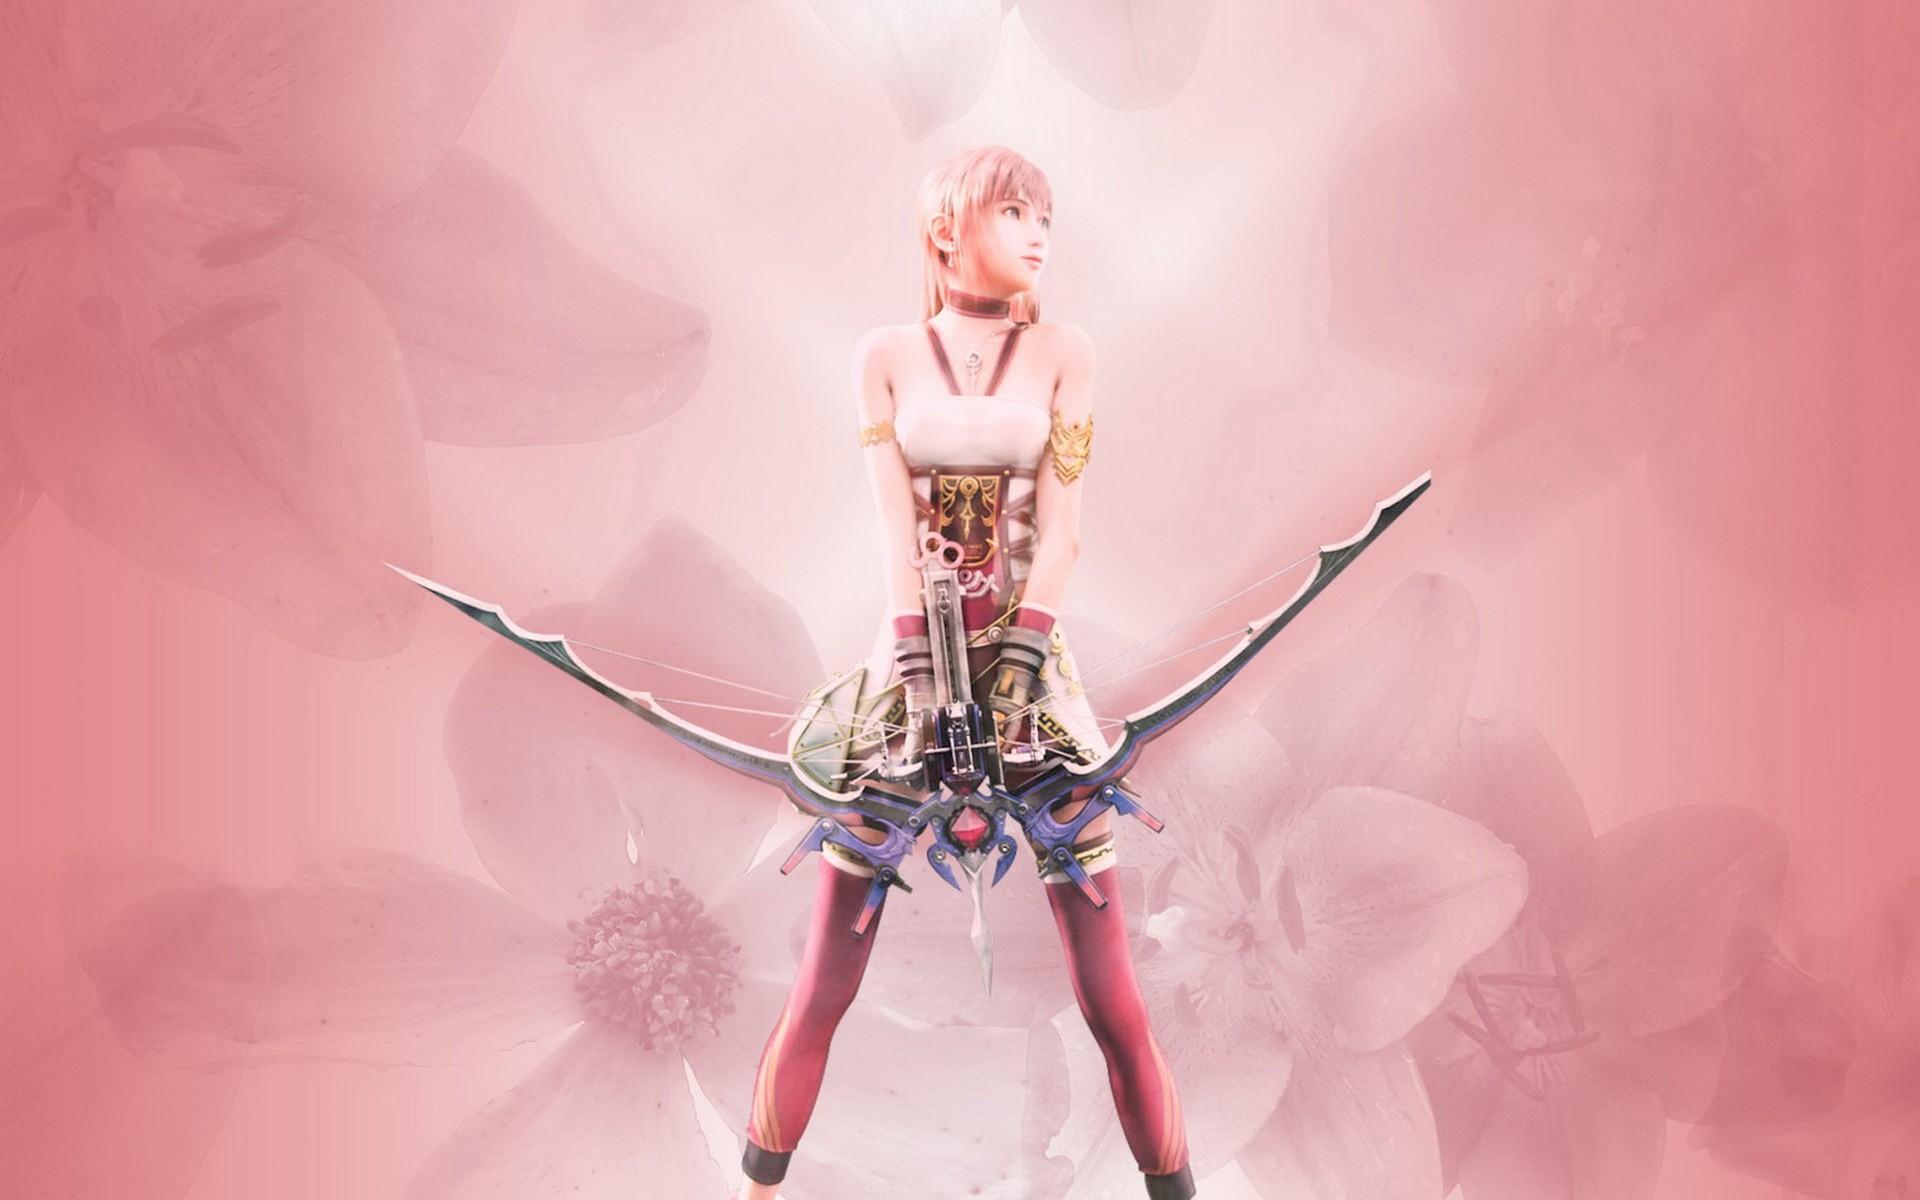 Final Fantasy Final Fantasy Xiii Serah Farron Wallpaper